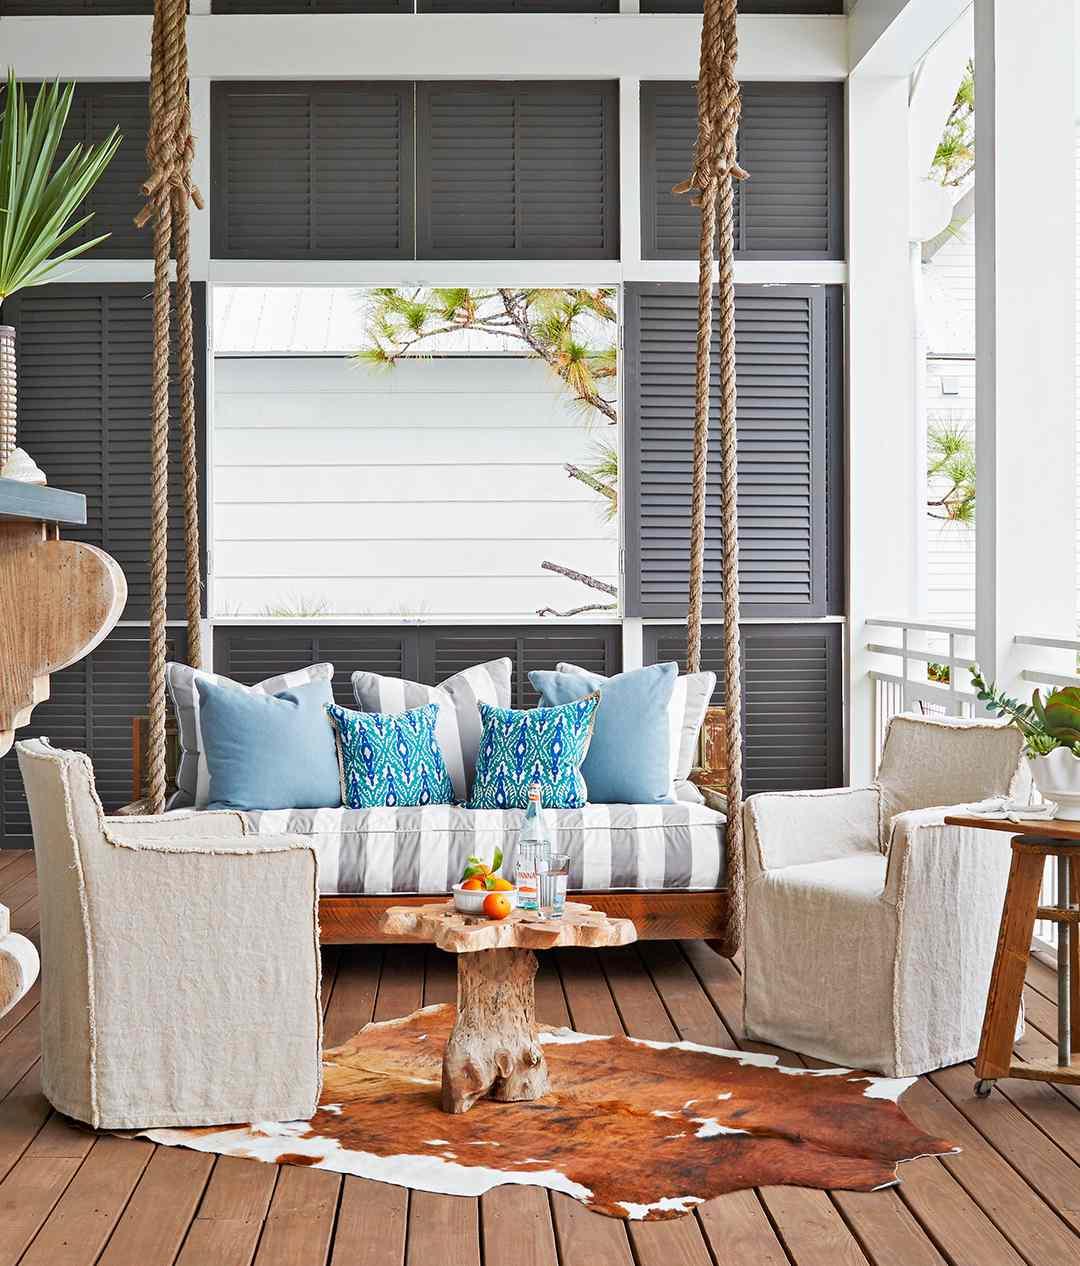 This Florida Beach House Mixes Urban Flair And Rustic Charm